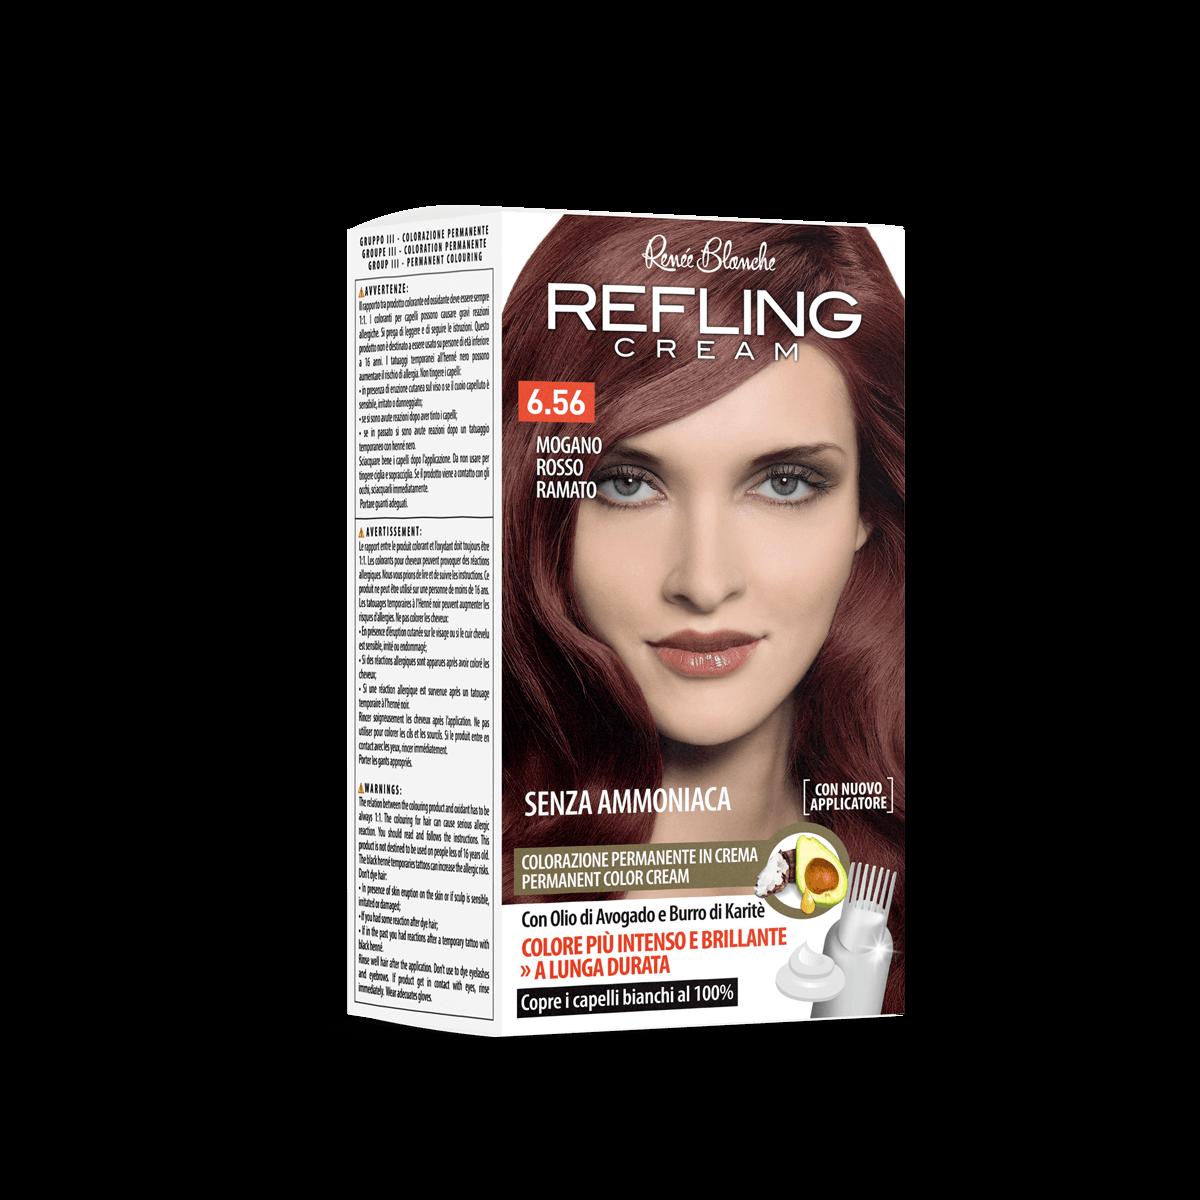 [:it]rosso-mogano-ramato-refling[:]